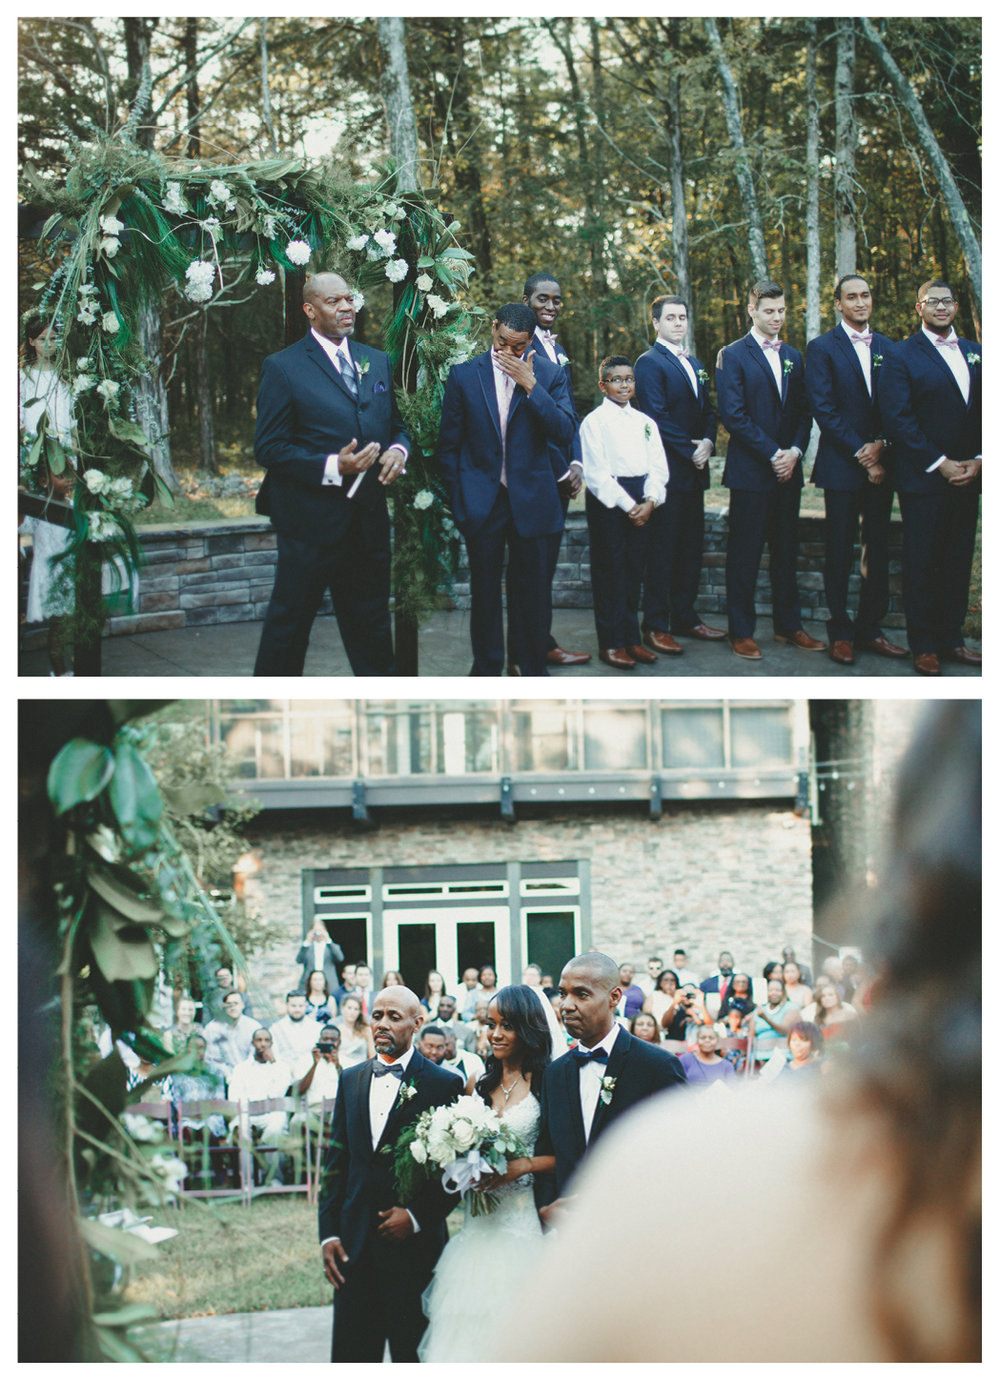 Ceremony7.jpg